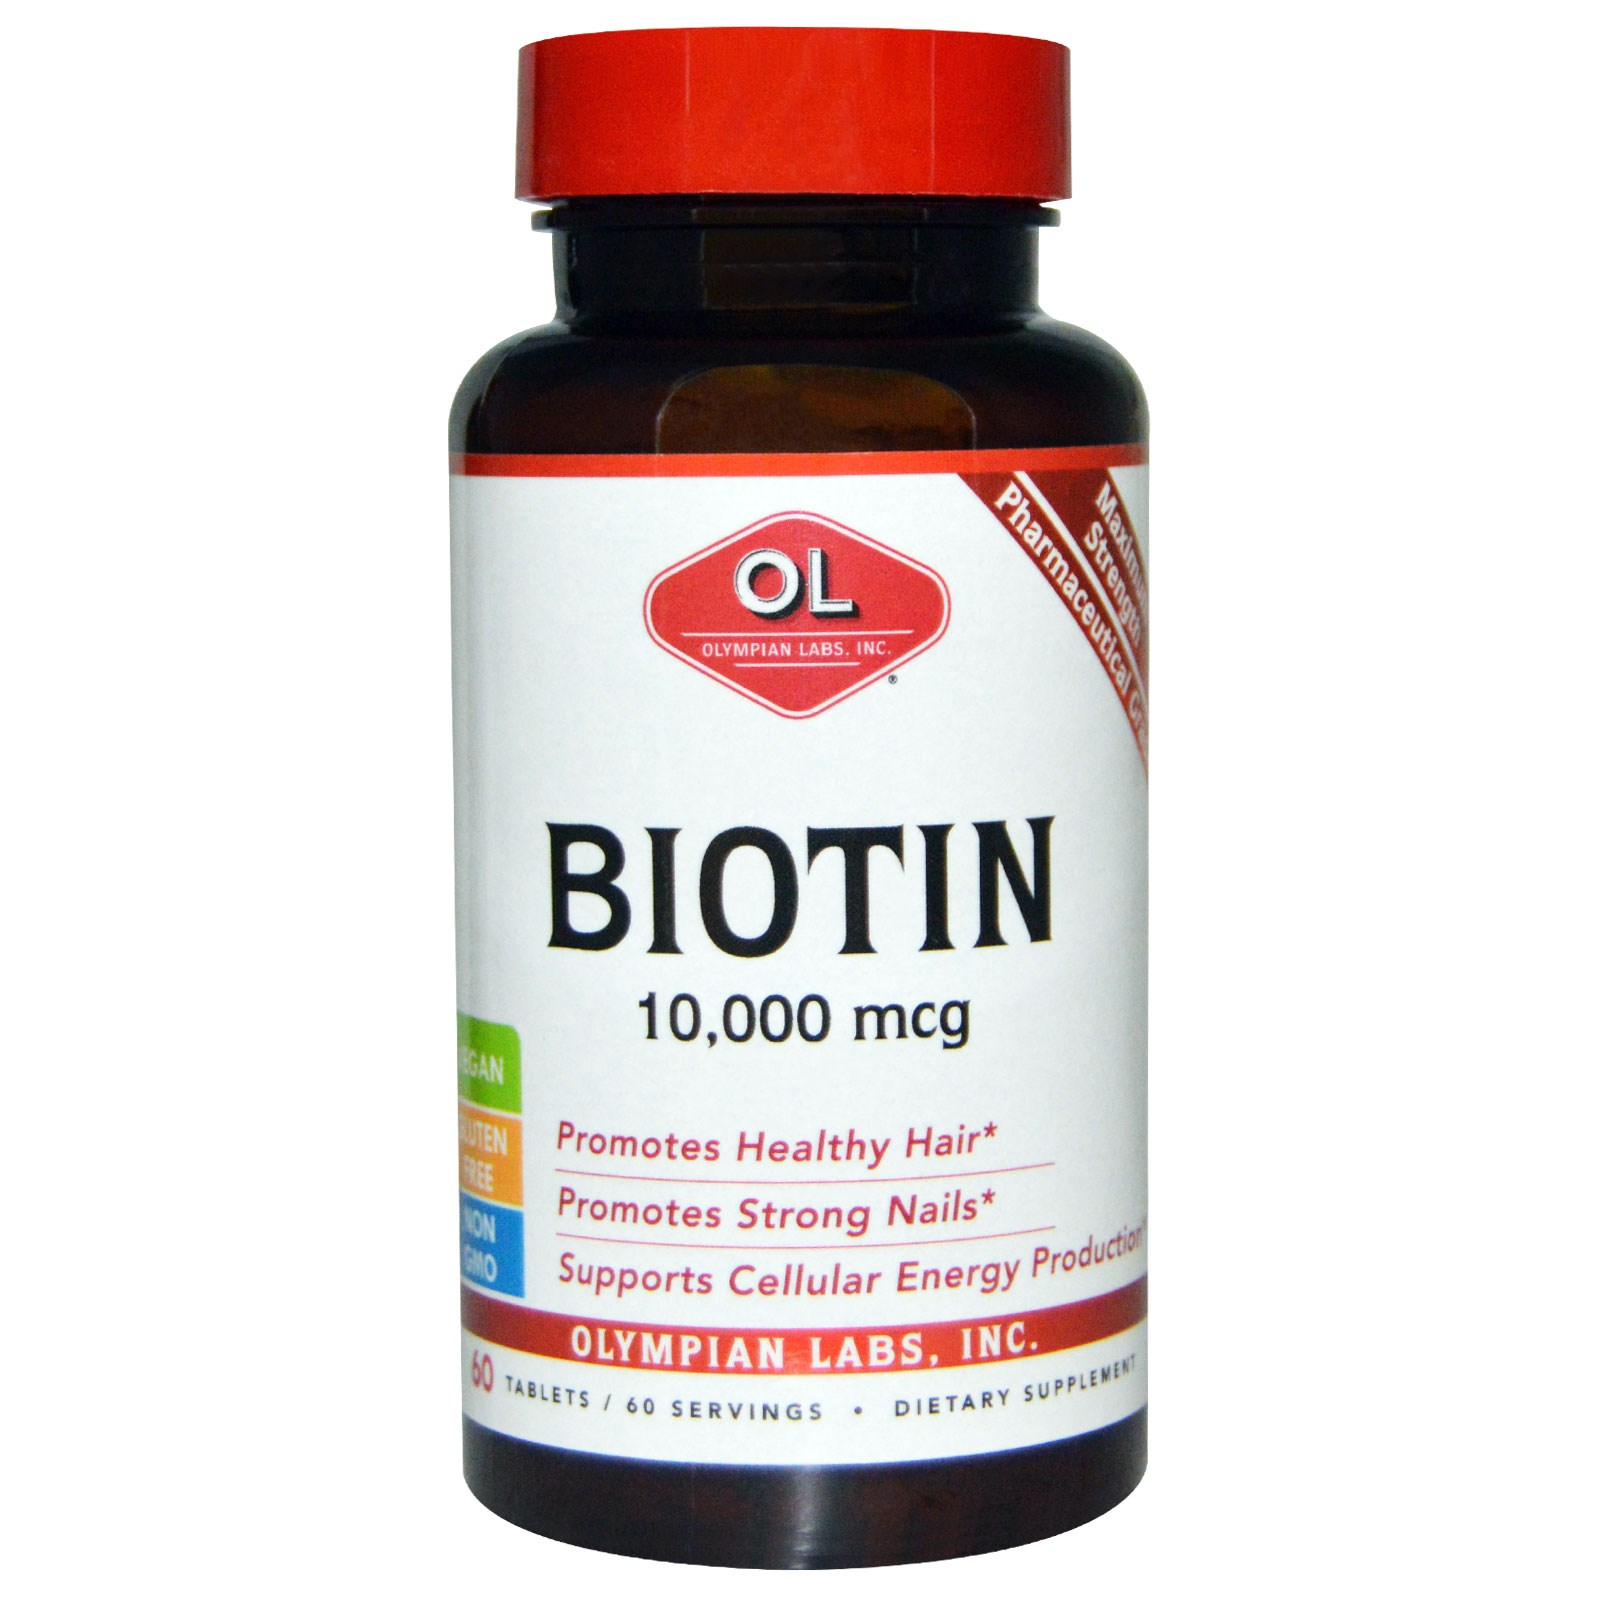 Olympian Labs Inc., Biotin, 10,000 mcg, 60 Tablets na ...